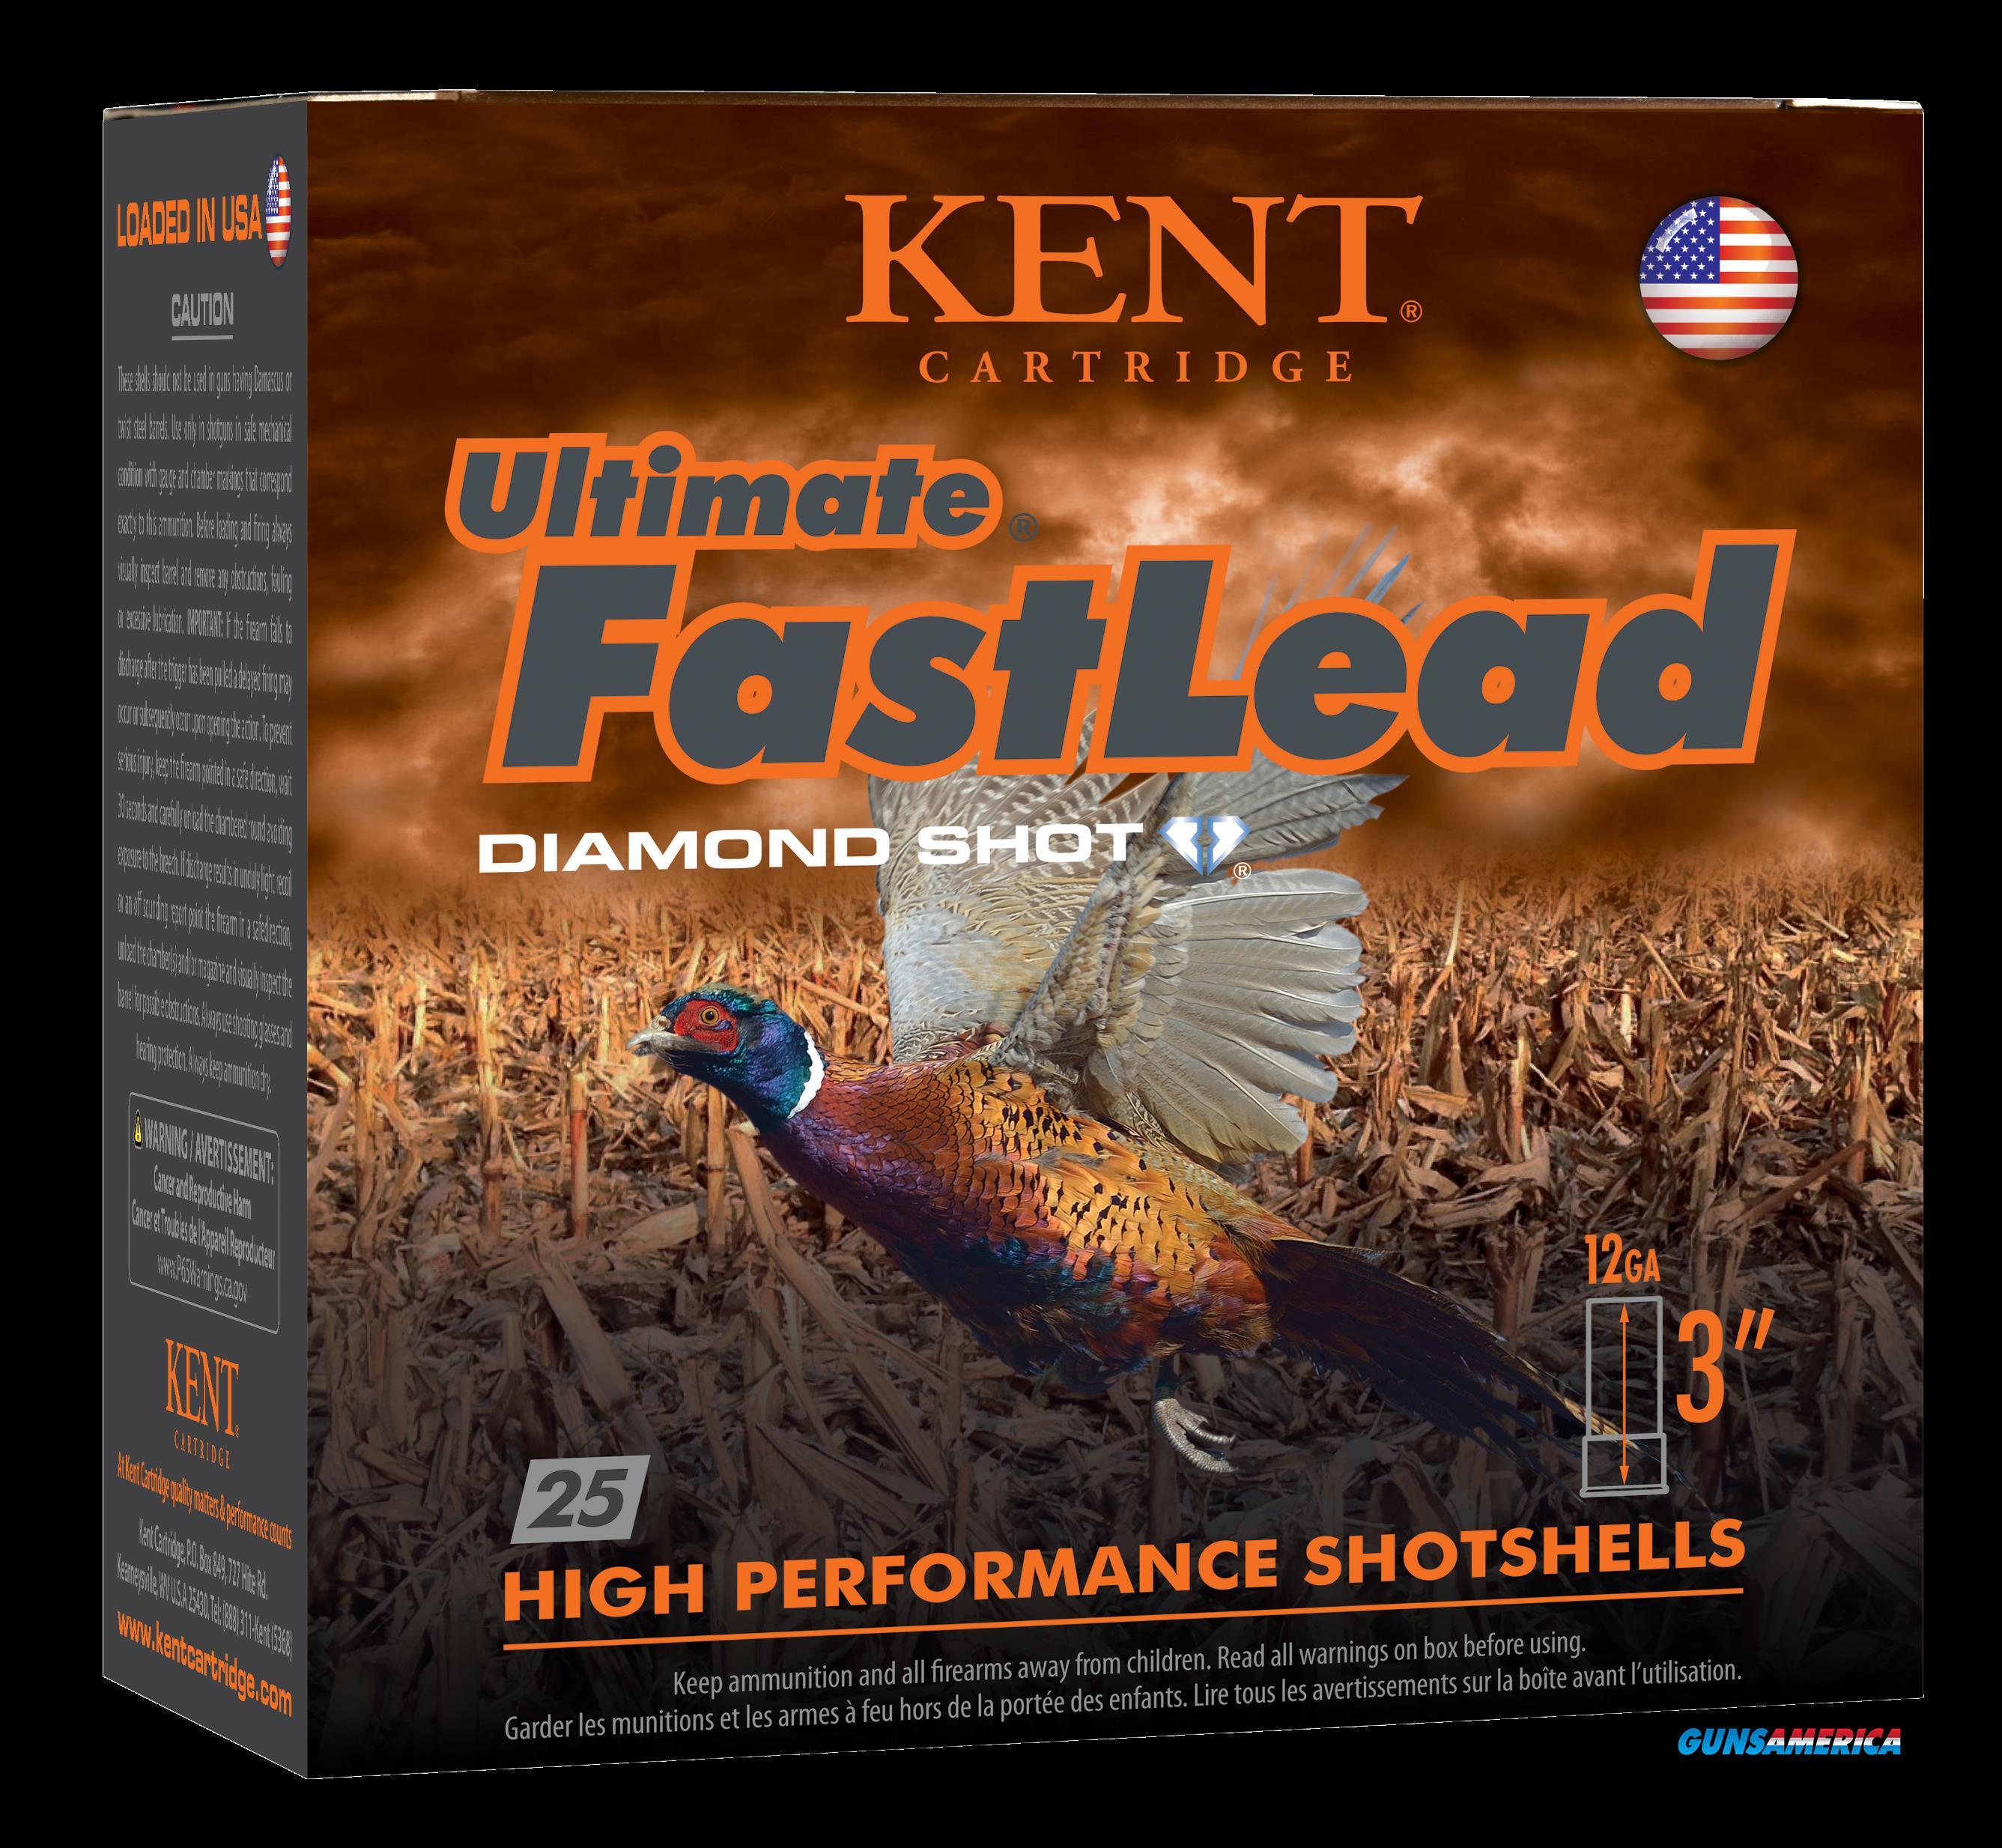 Kent Cartridge Ultimate Fast Lead, Kent K123ufl505  3in  13-4 Ultimate Fast Ld  25-10  Guns > Pistols > 1911 Pistol Copies (non-Colt)